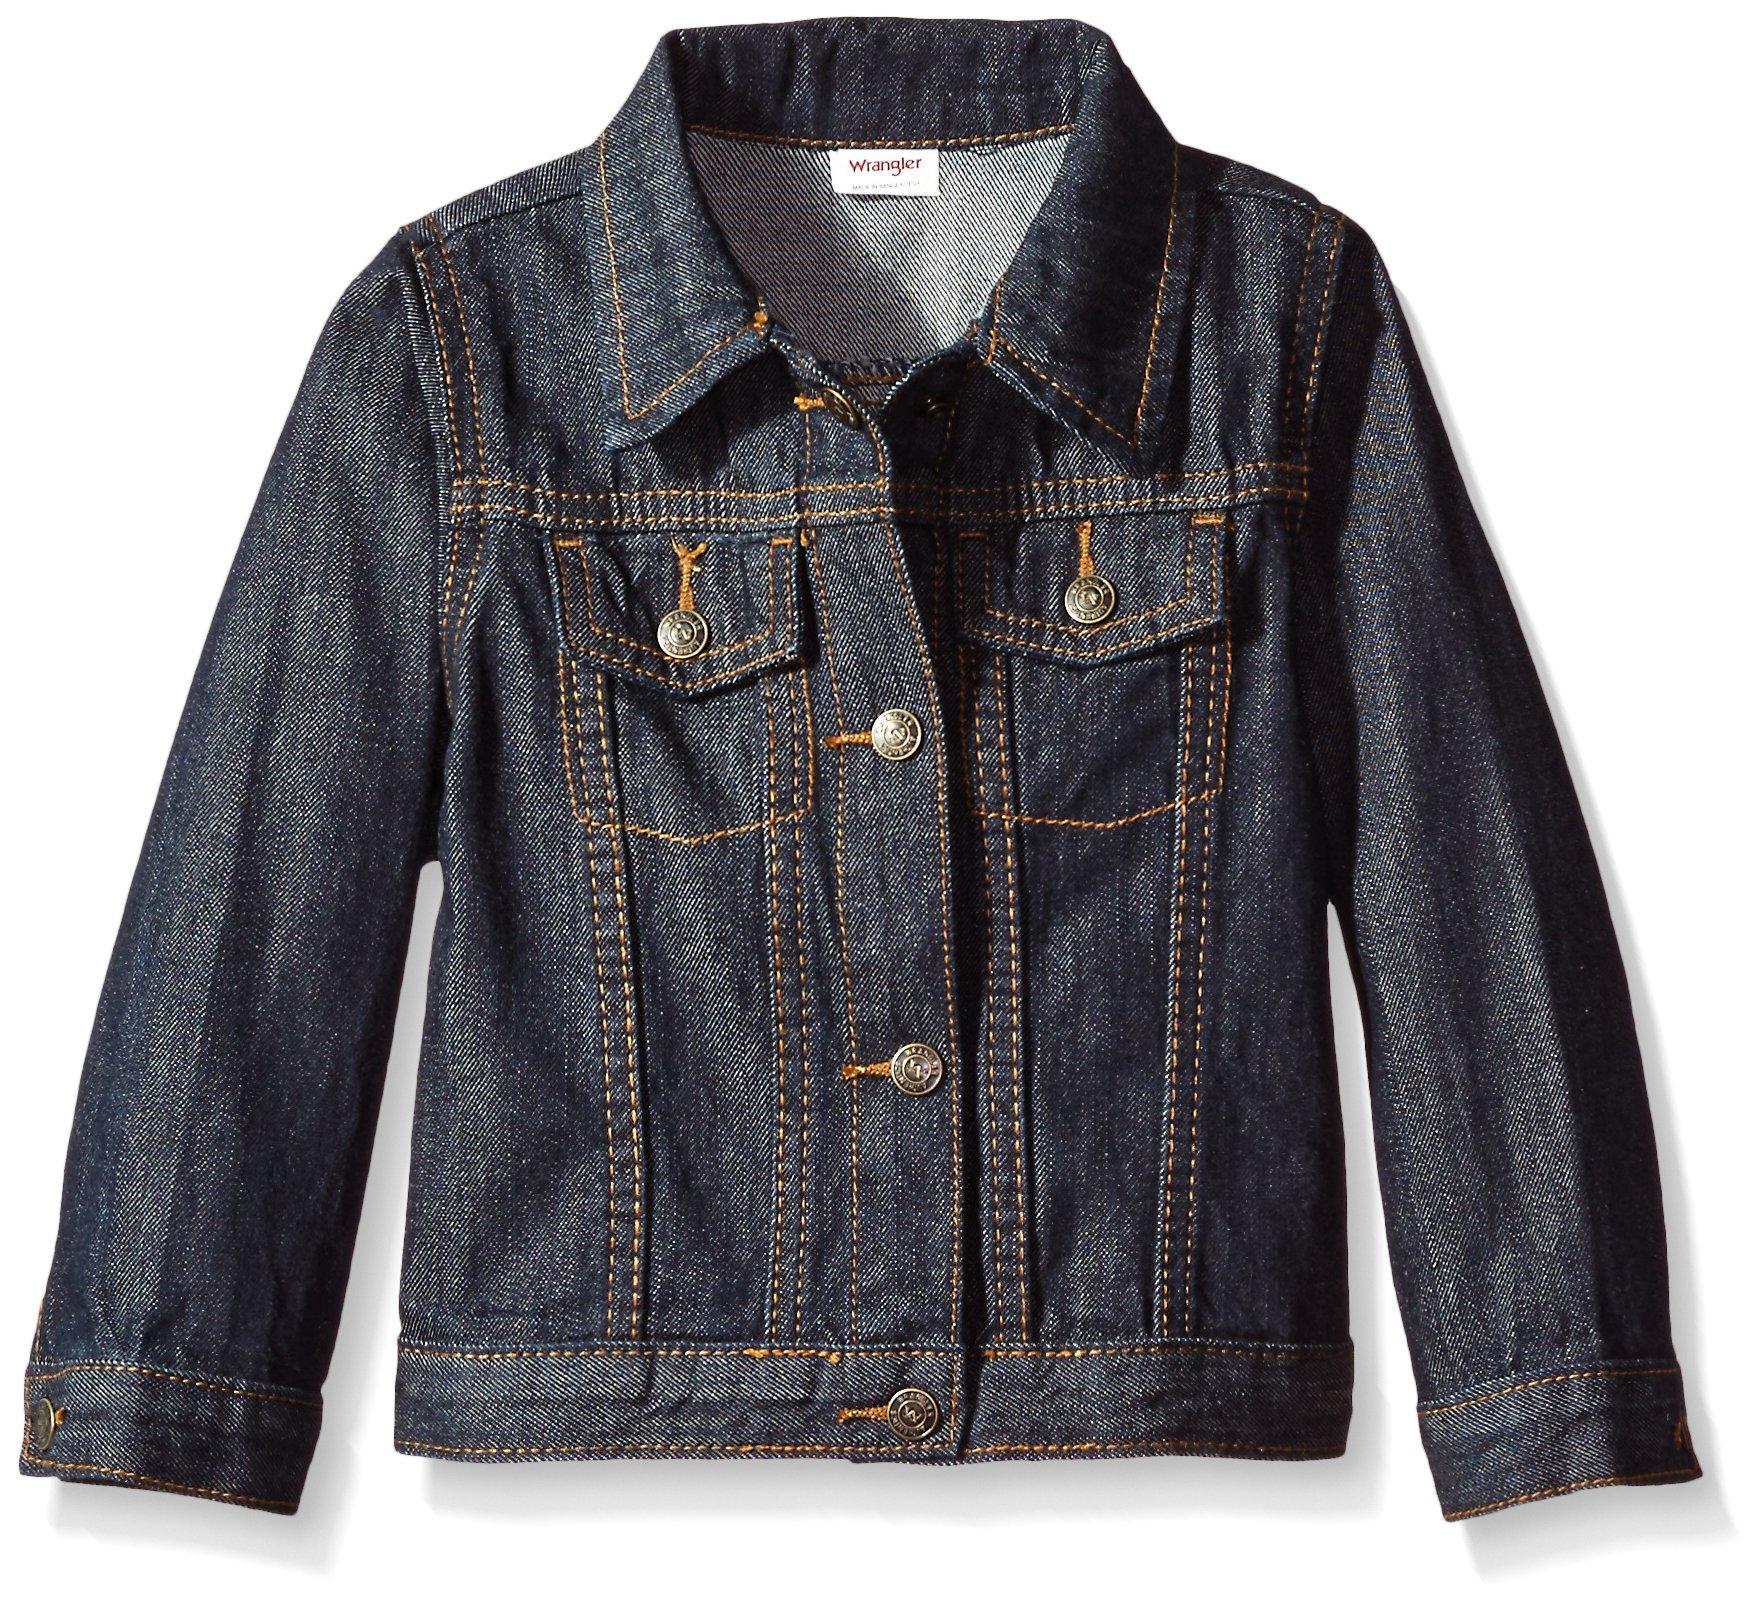 Wrangler Toddler Boys' Authentics Denim Jacket, Ocean Deep, 2T